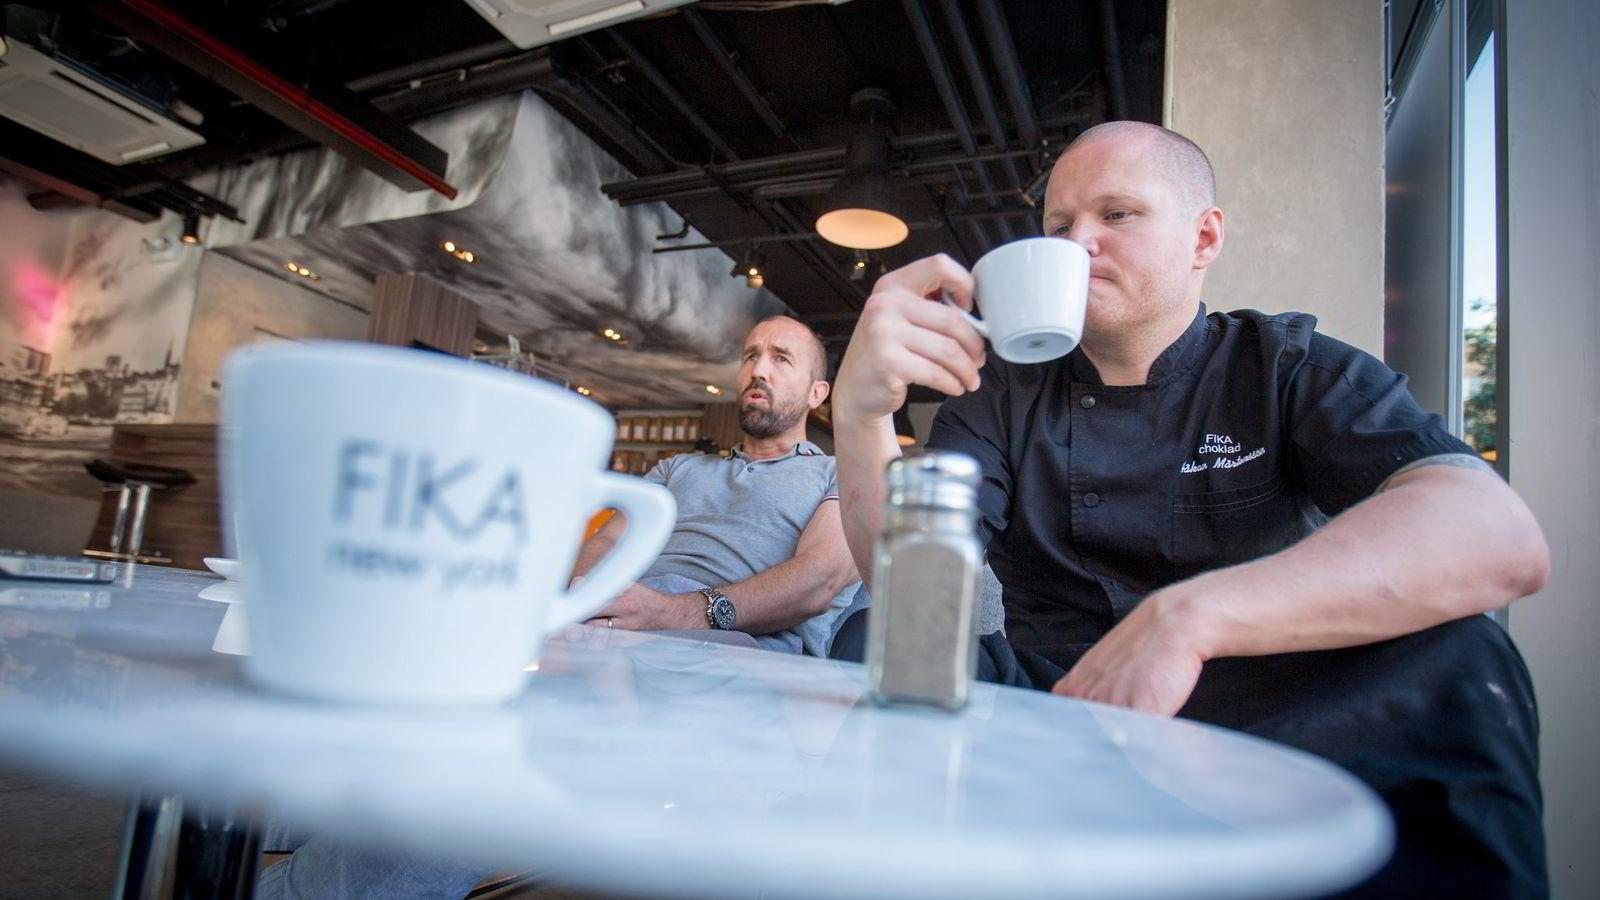 FIKER TIL. Lars Åkerlund (til venstre) og Håkan Mårtensson vil drive den mest eksklusive kaffekjeden på Manhattan. Filmstjerner og finansprofiler er stamkunder på denne Fika-kafeen i Tribeca sørvest på Manhattan. Foto: